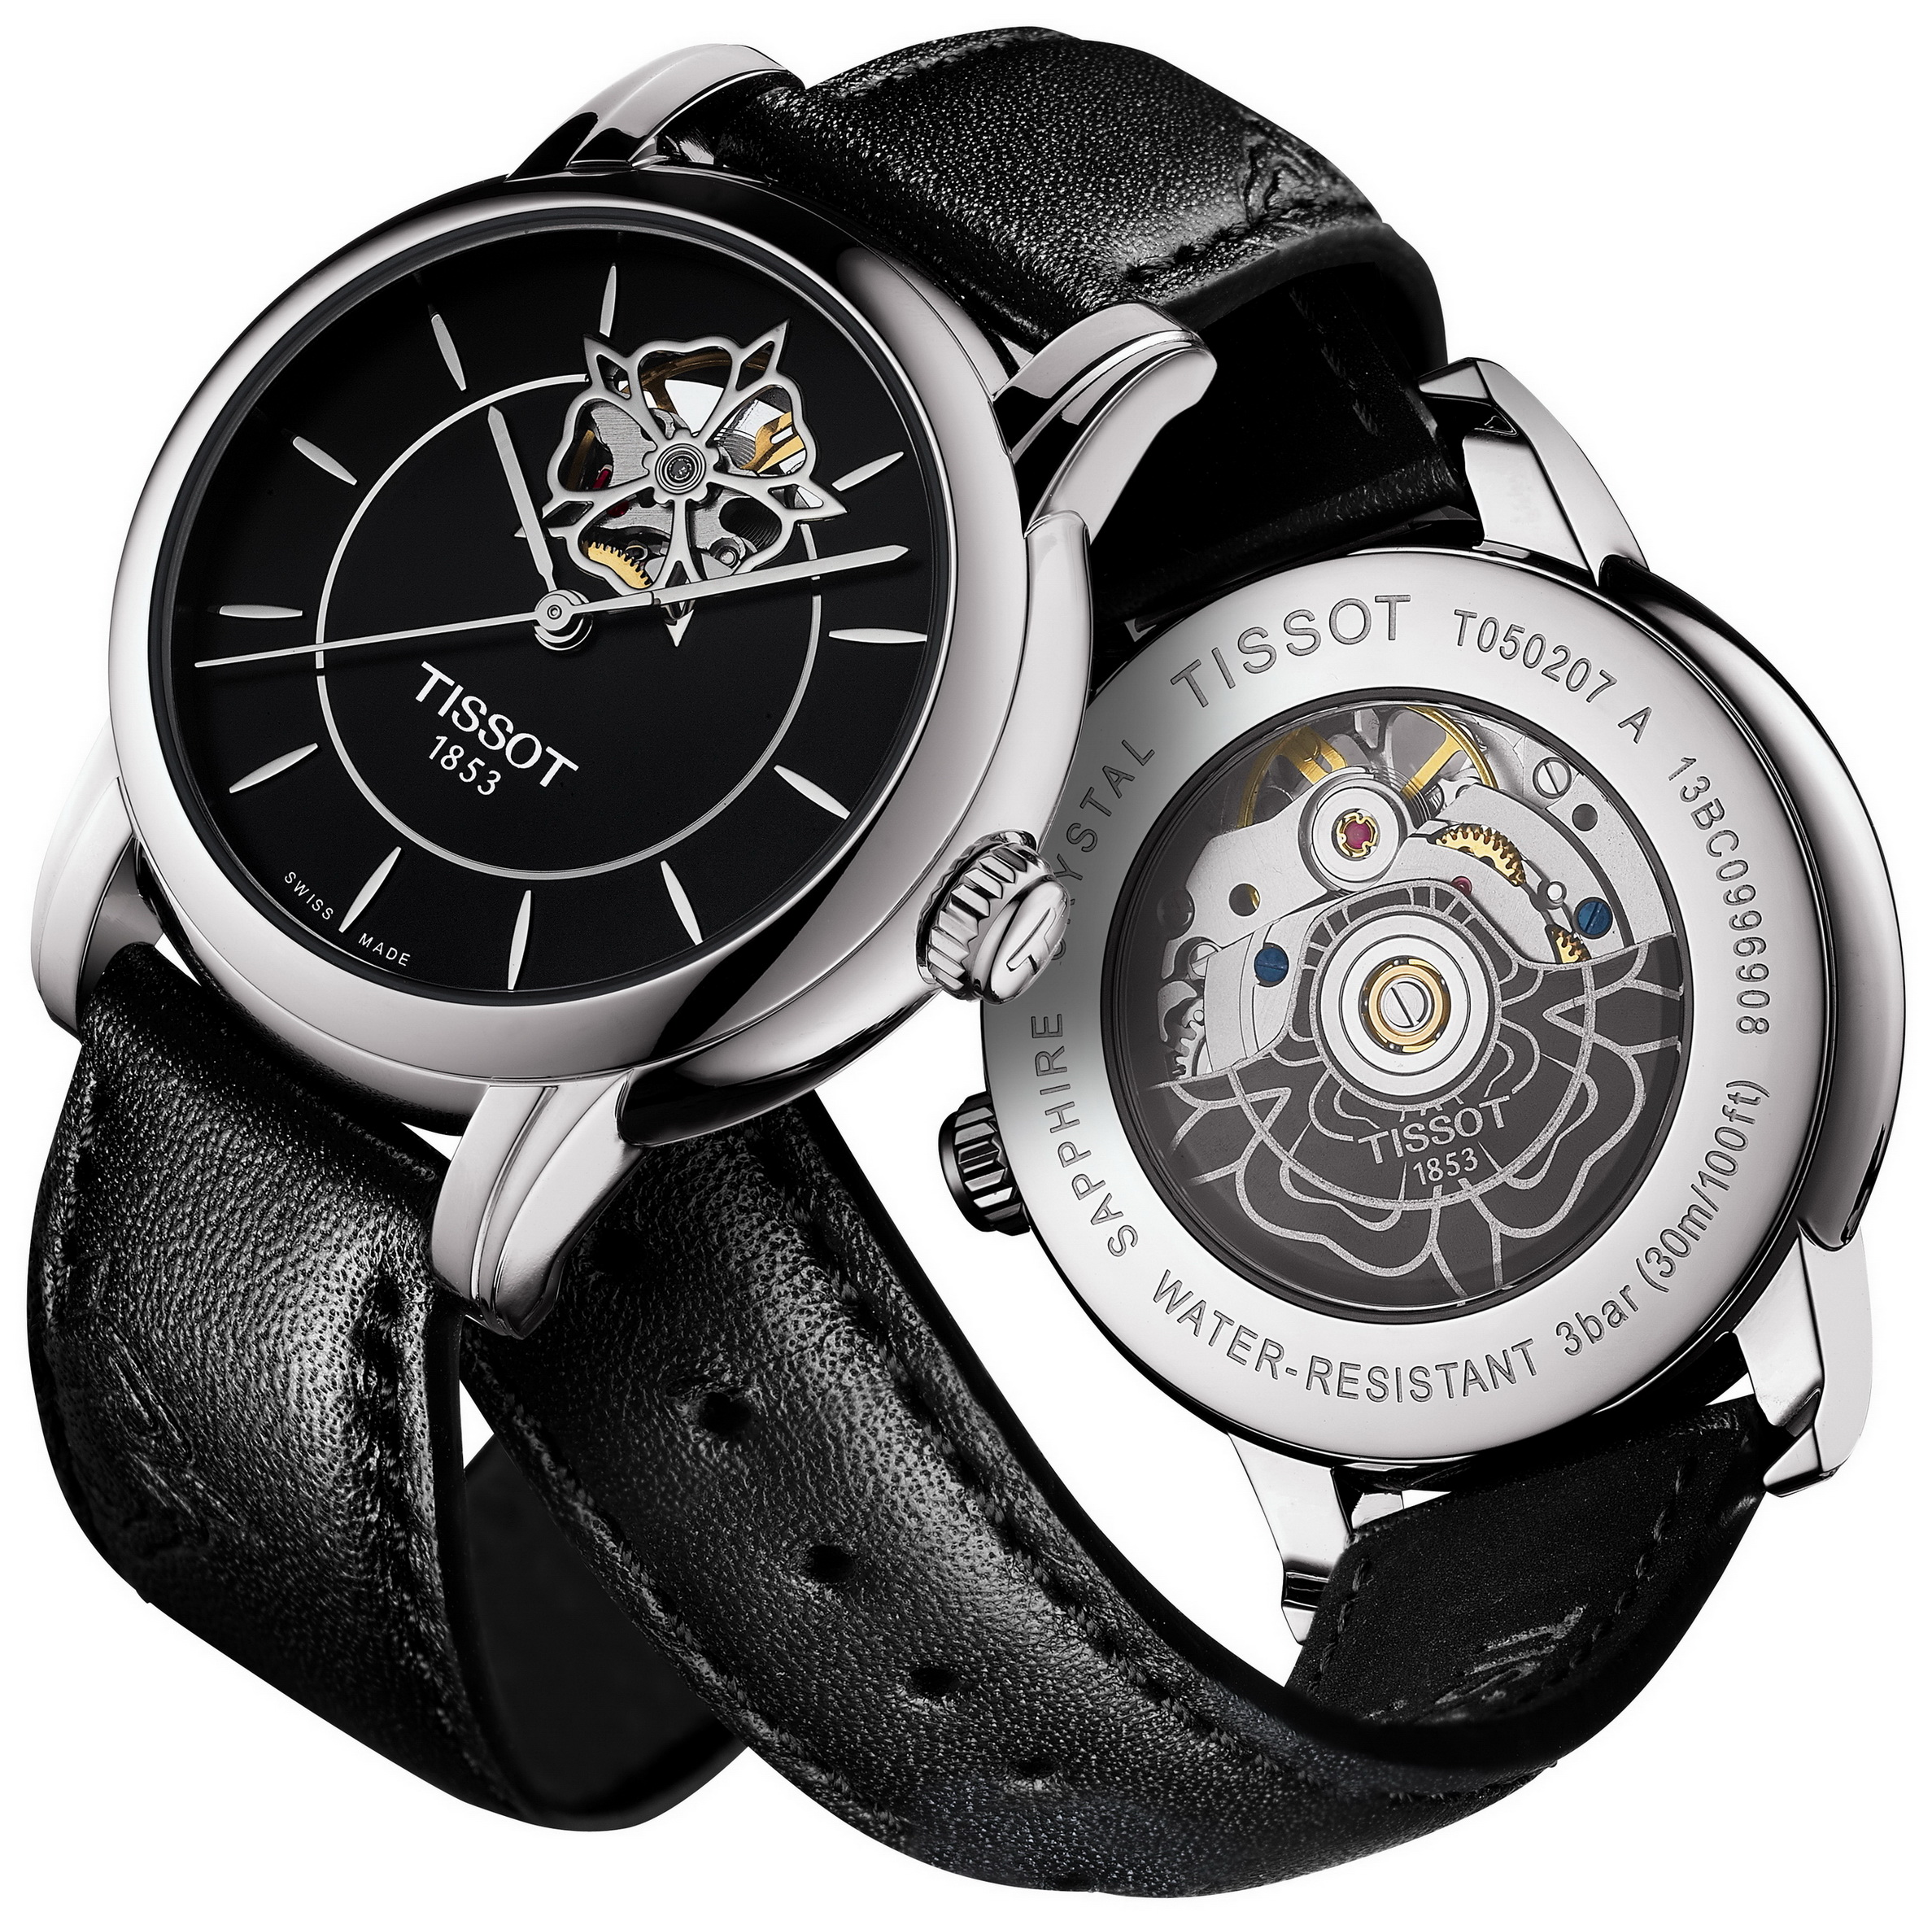 圖1.TISSOT Lady Heart 80小時自動腕錶 NT$ 22,500